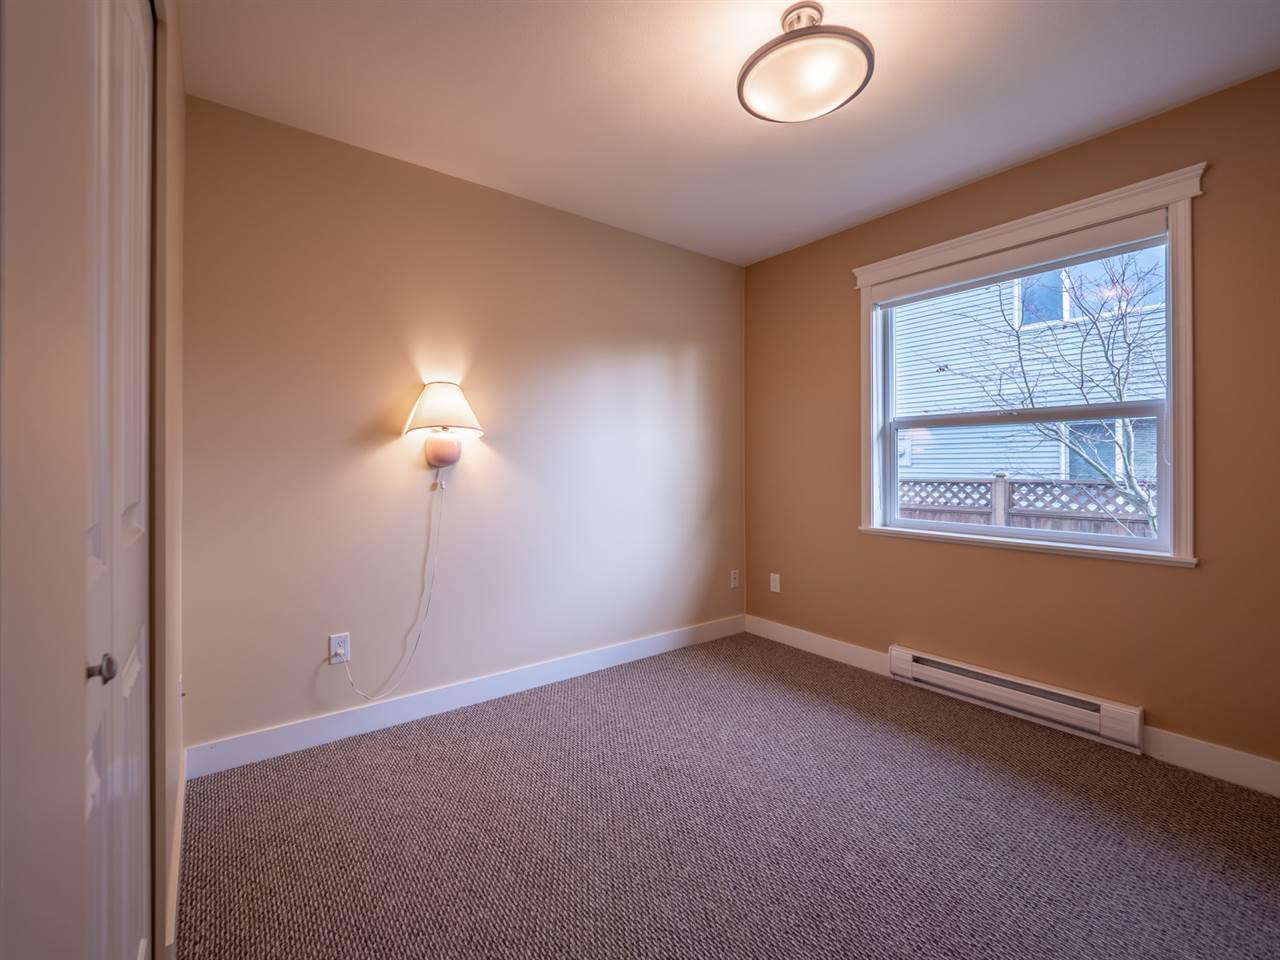 Photo 13: Photos: 5708 EMILY Way in Sechelt: Sechelt District House for sale (Sunshine Coast)  : MLS®# R2328606